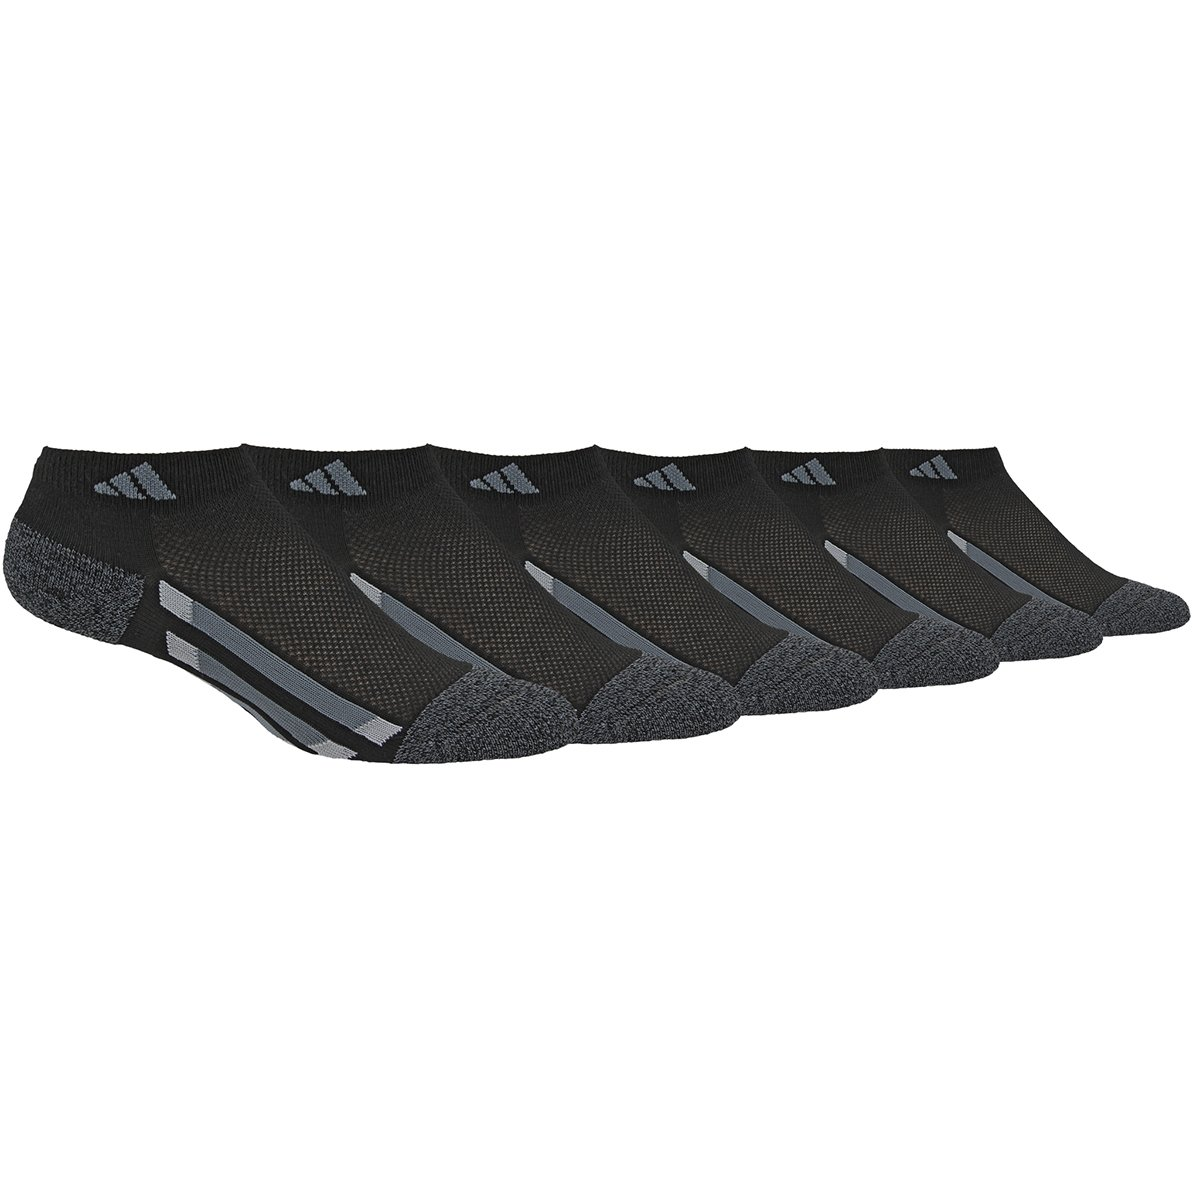 adidas Youth Kids-Boy's/Girl's Cushioned Low Cut Socks (6-Pair), Black/Black - Onix Marl/Light Onix/Onix, Large, (Shoe Size 3Y-9) by adidas